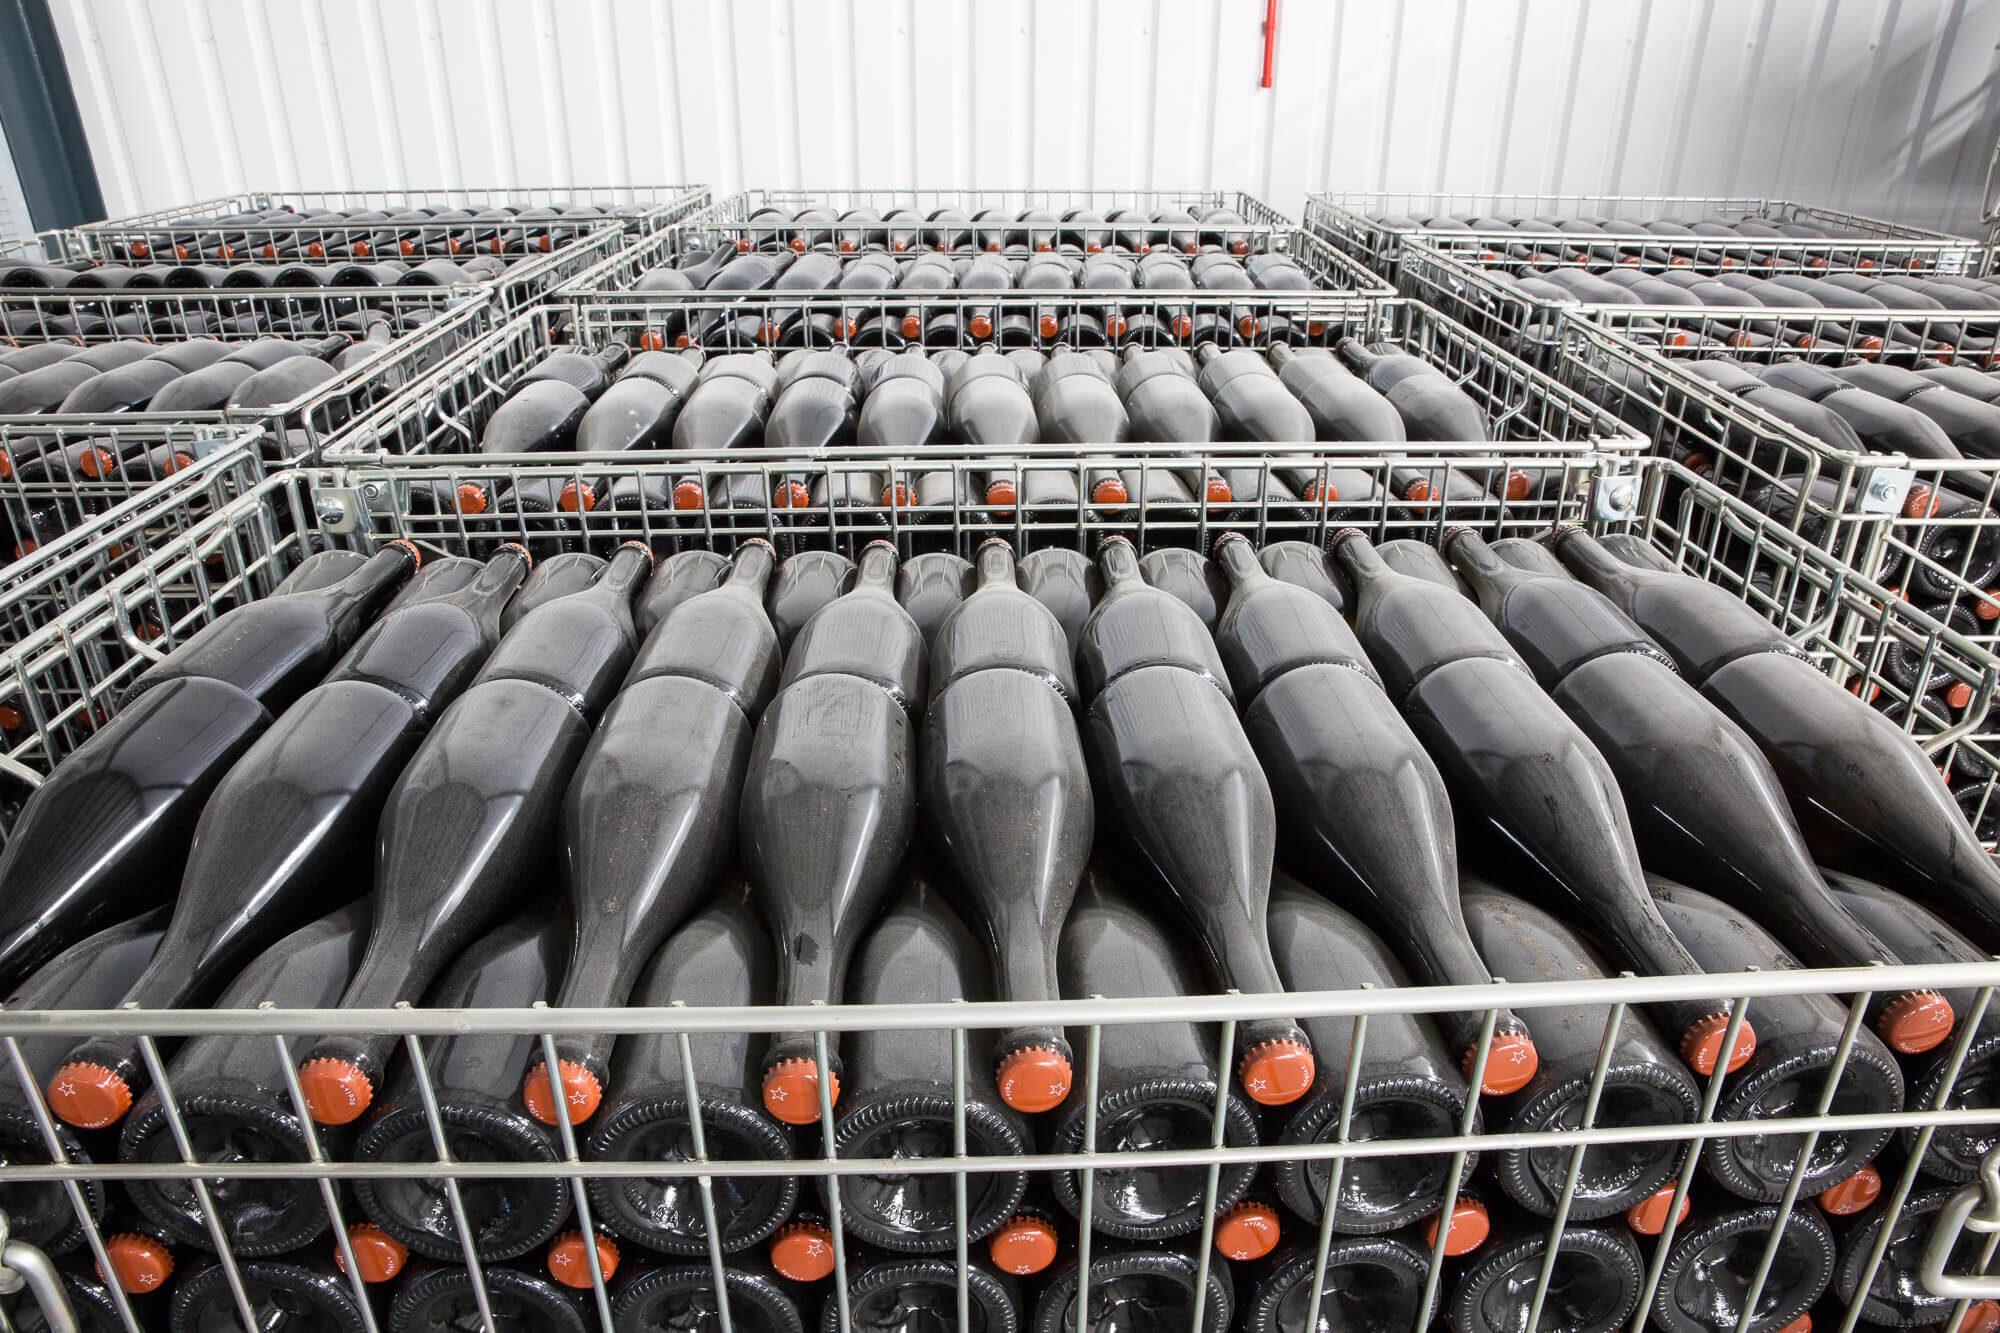 Rathfinny bottles